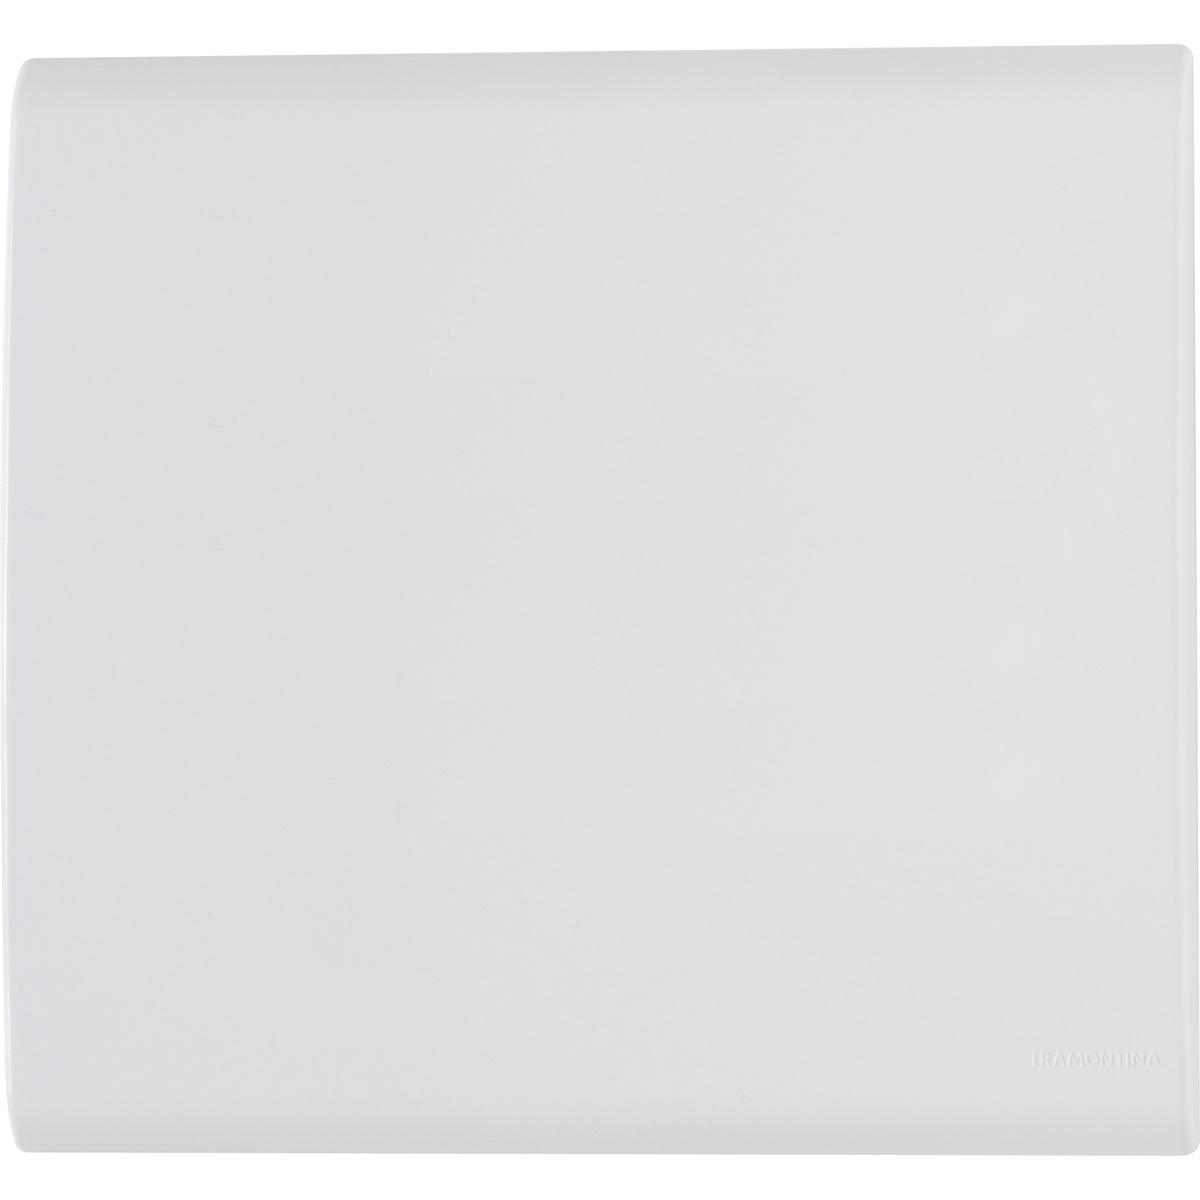 Placa cega - 4x4 - Tramontina